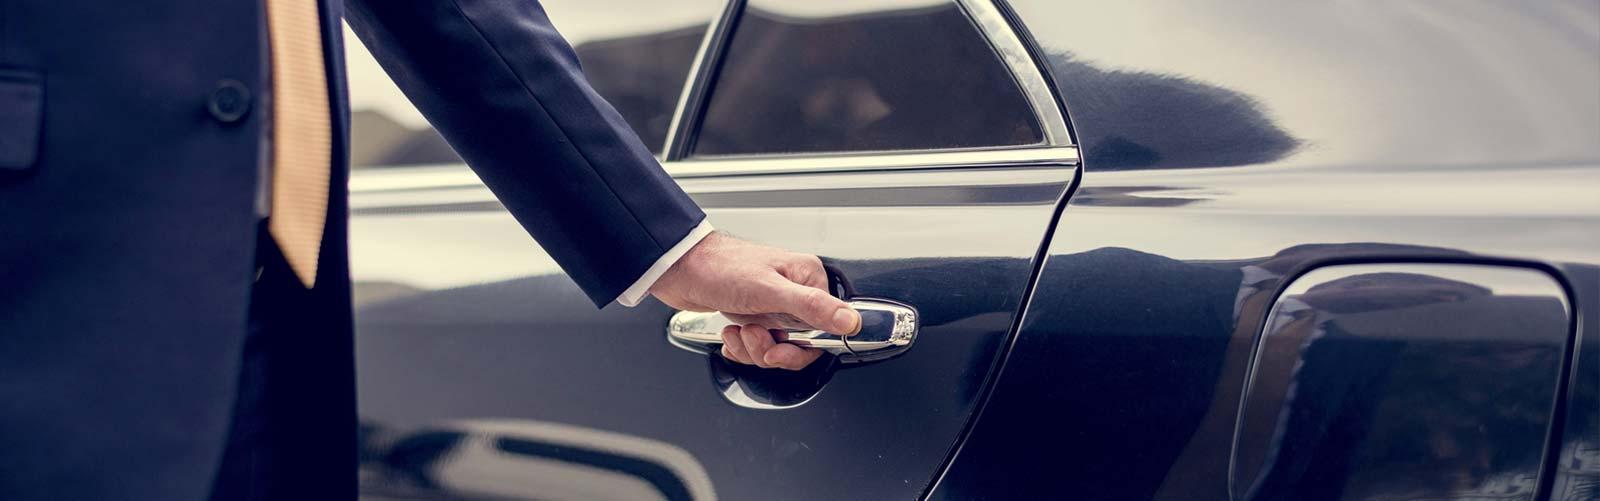 chauffeur driven service